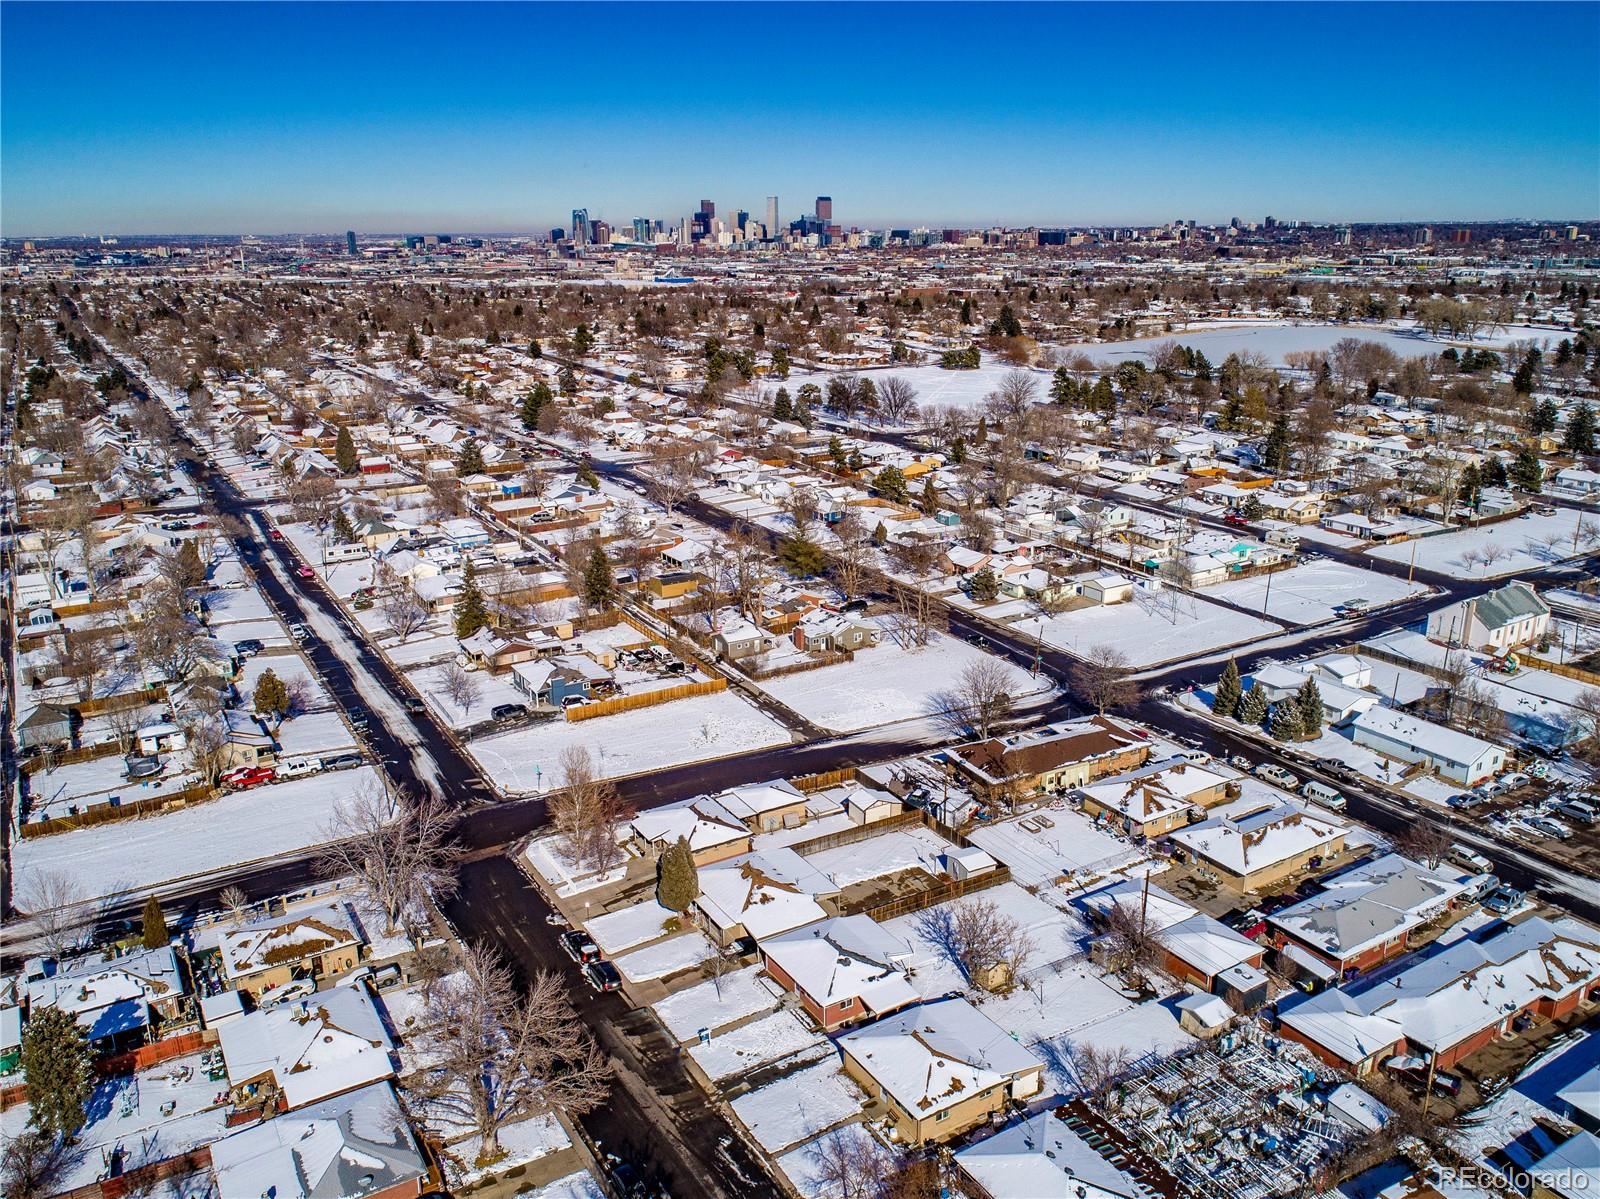 MLS# 3116030 - 5 - 1020 S Decatur Street, Denver, CO 80219